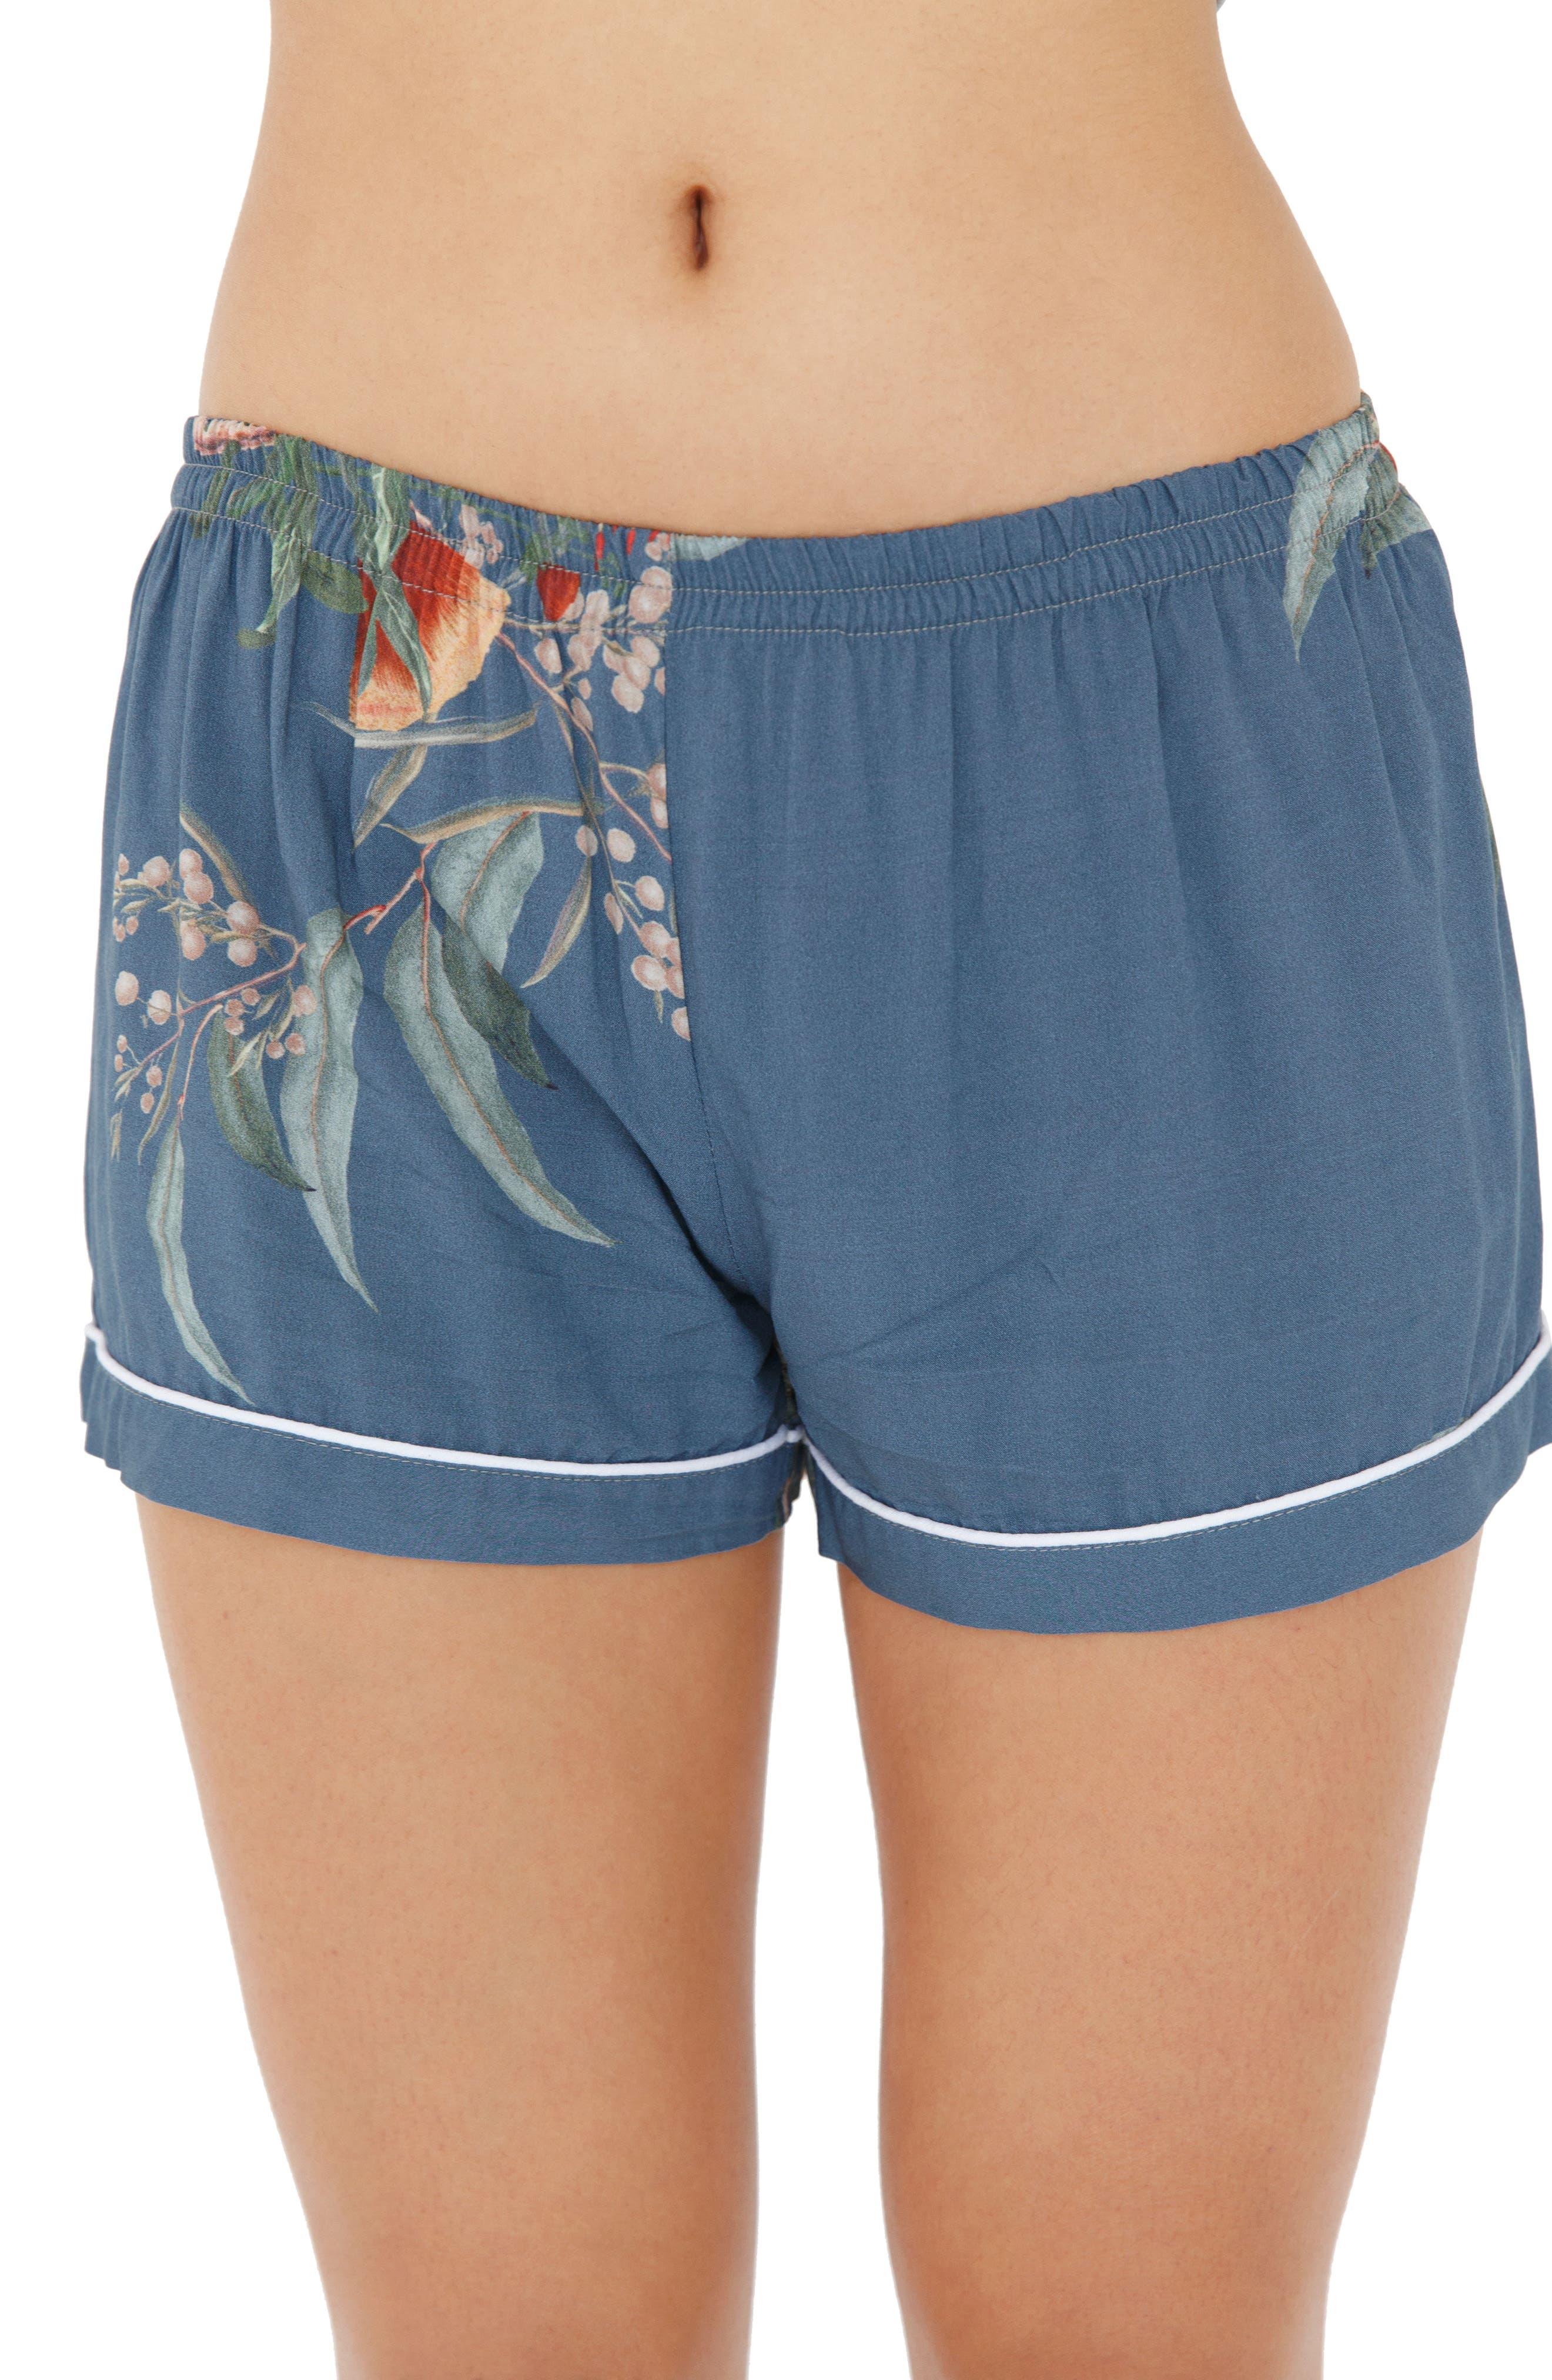 Floral Short Pajamas,                             Alternate thumbnail 2, color,                             Jupiter